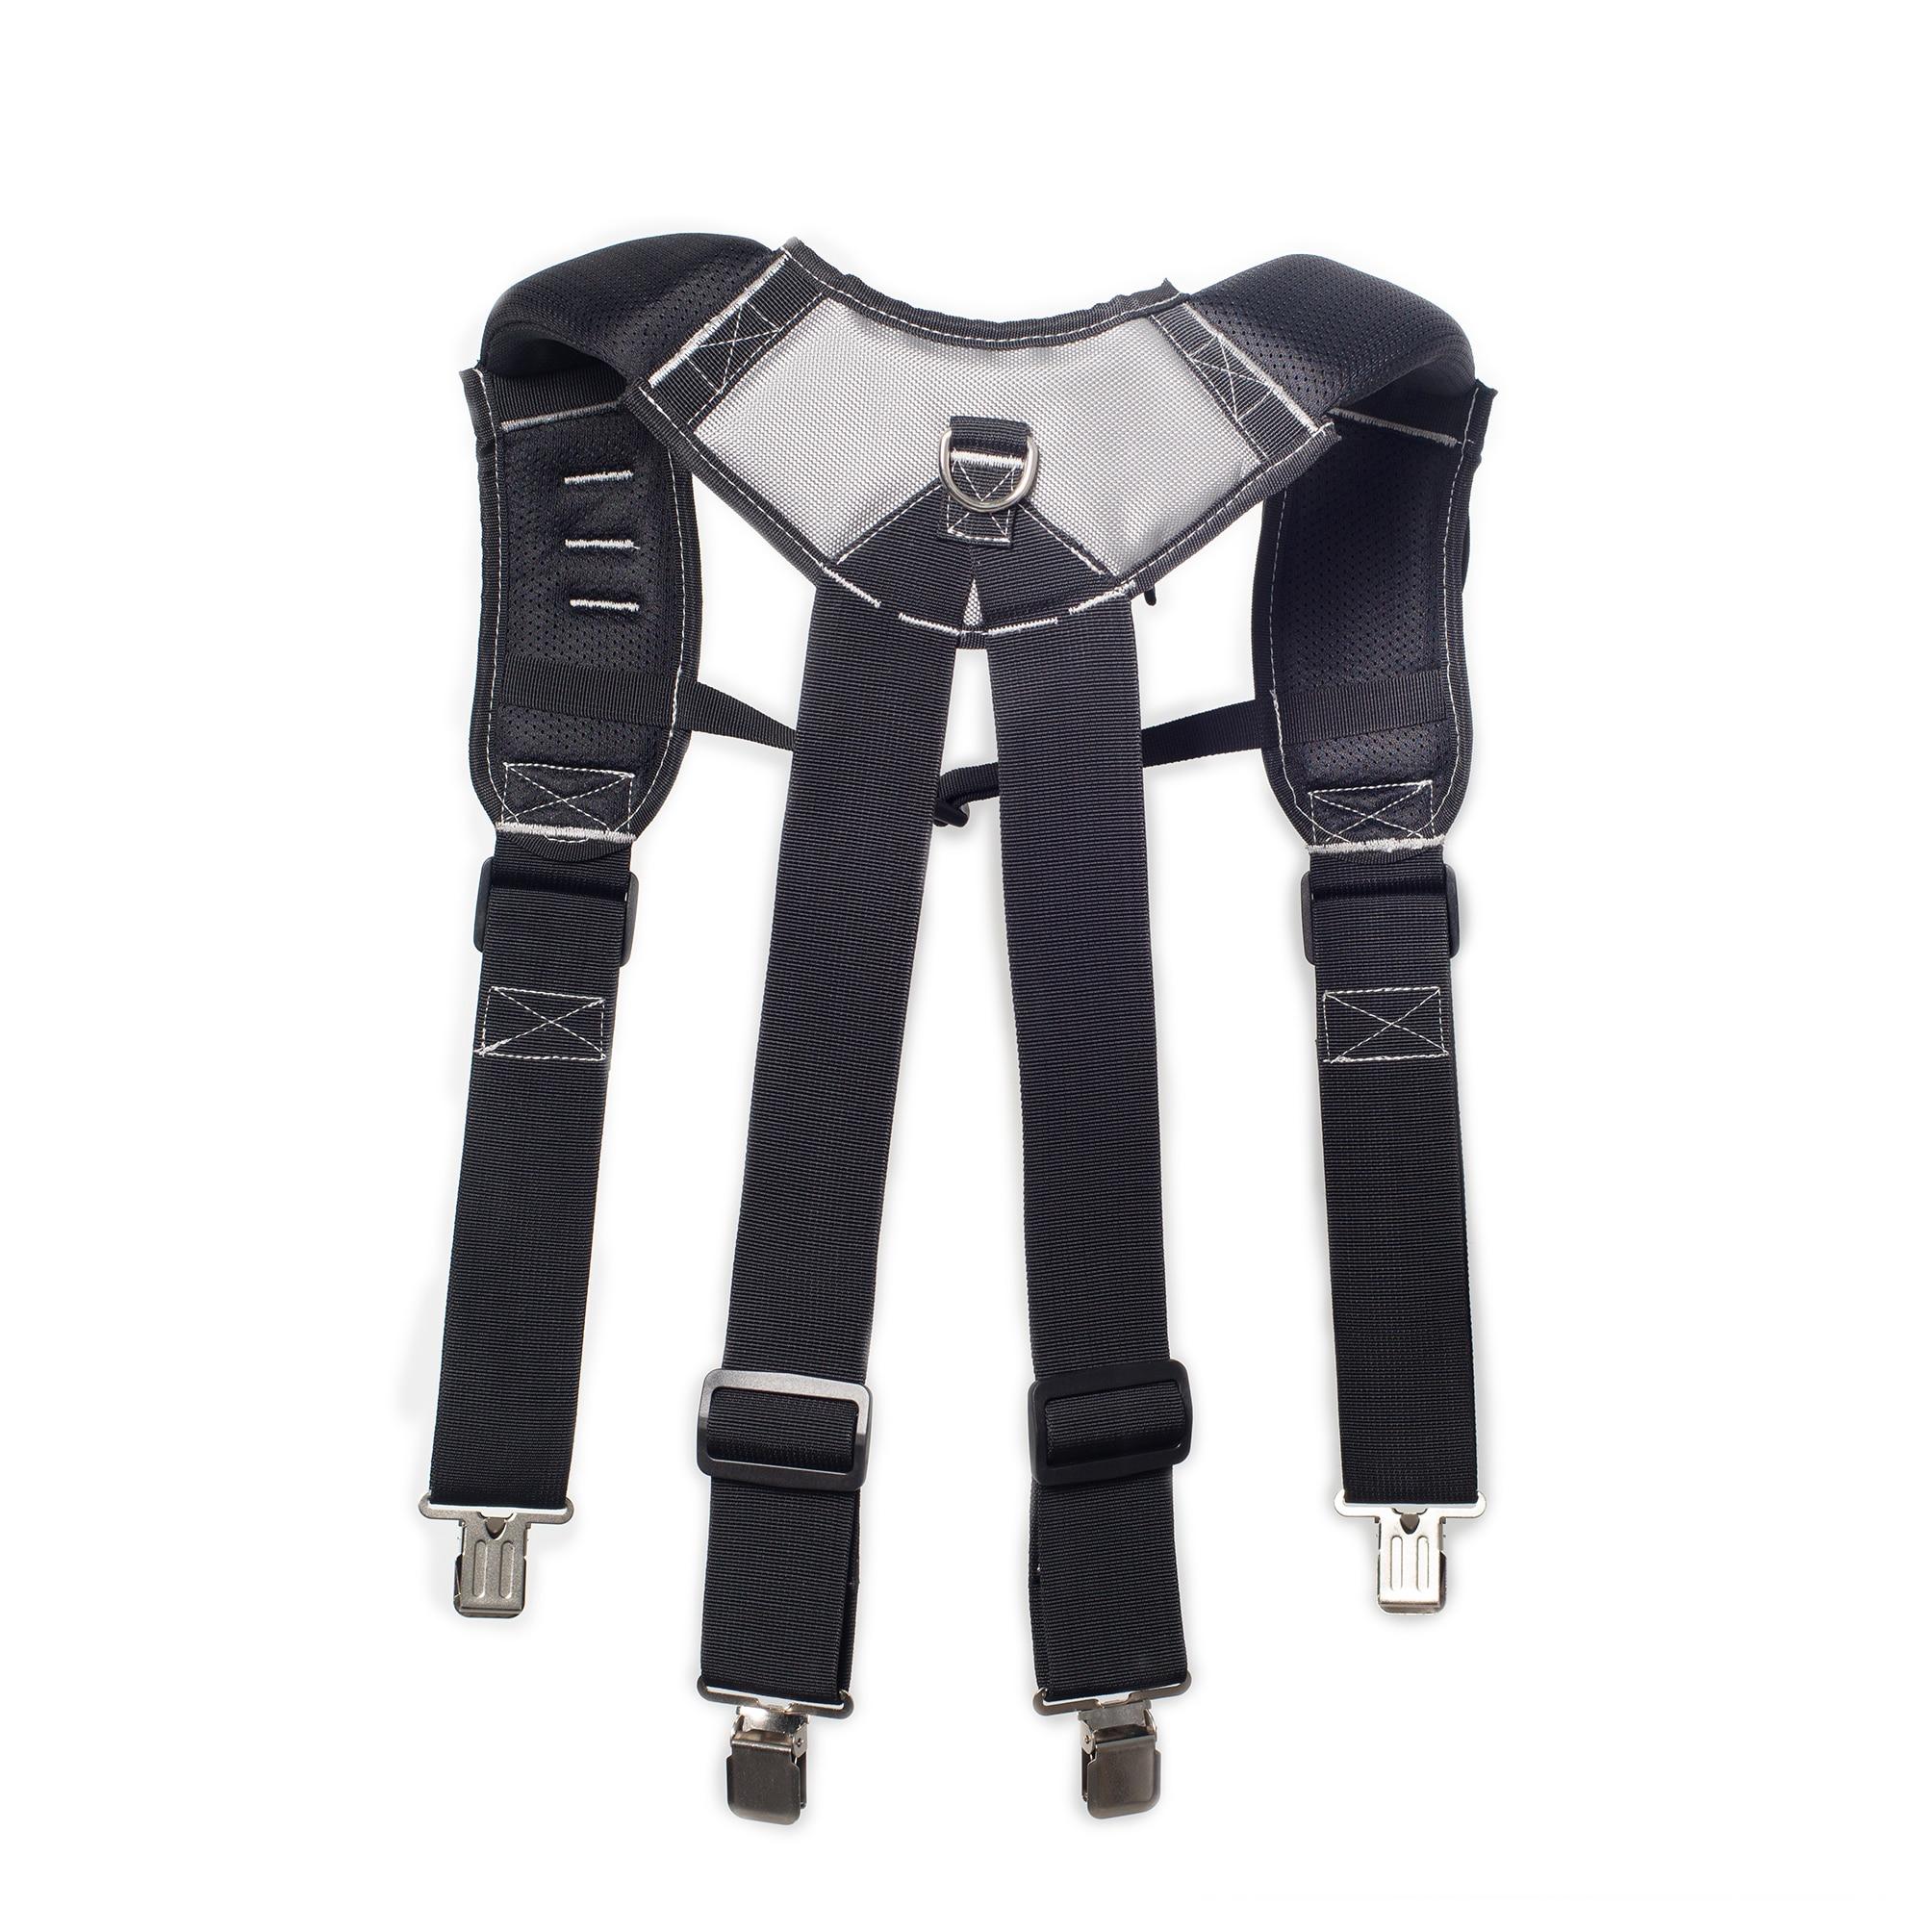 X Type Work Belt Braces Suspender Belt Heavy Work Tool Can Hang Tools Strapsen Strumpfhalter Shoulder Strap Tooling Suspenders